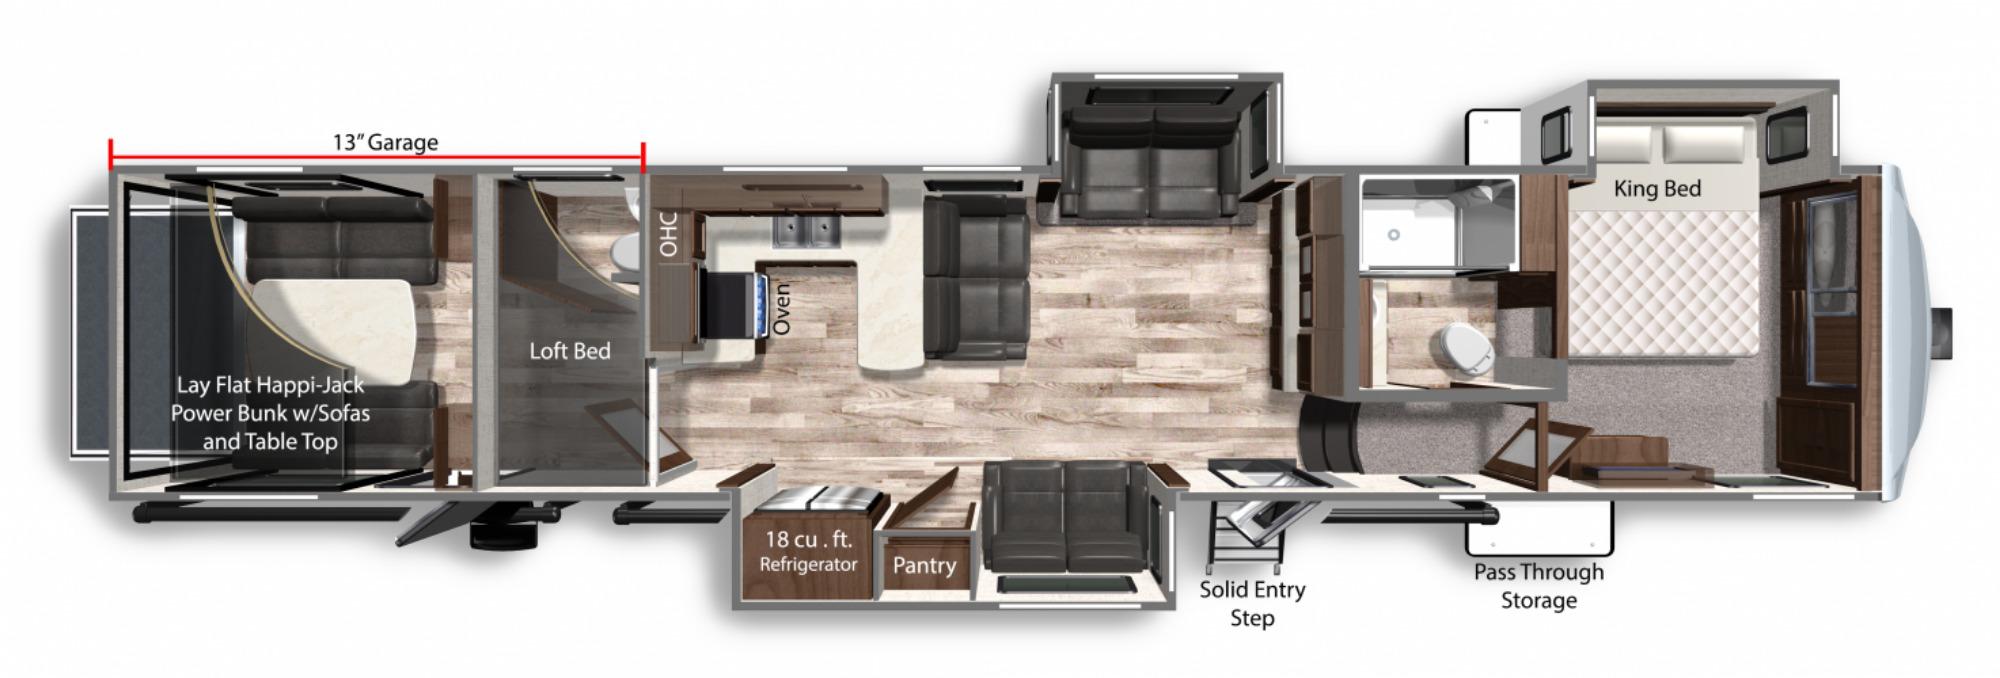 View Floor Plan for 2021 DUTCHMEN VOLTAGE 4225